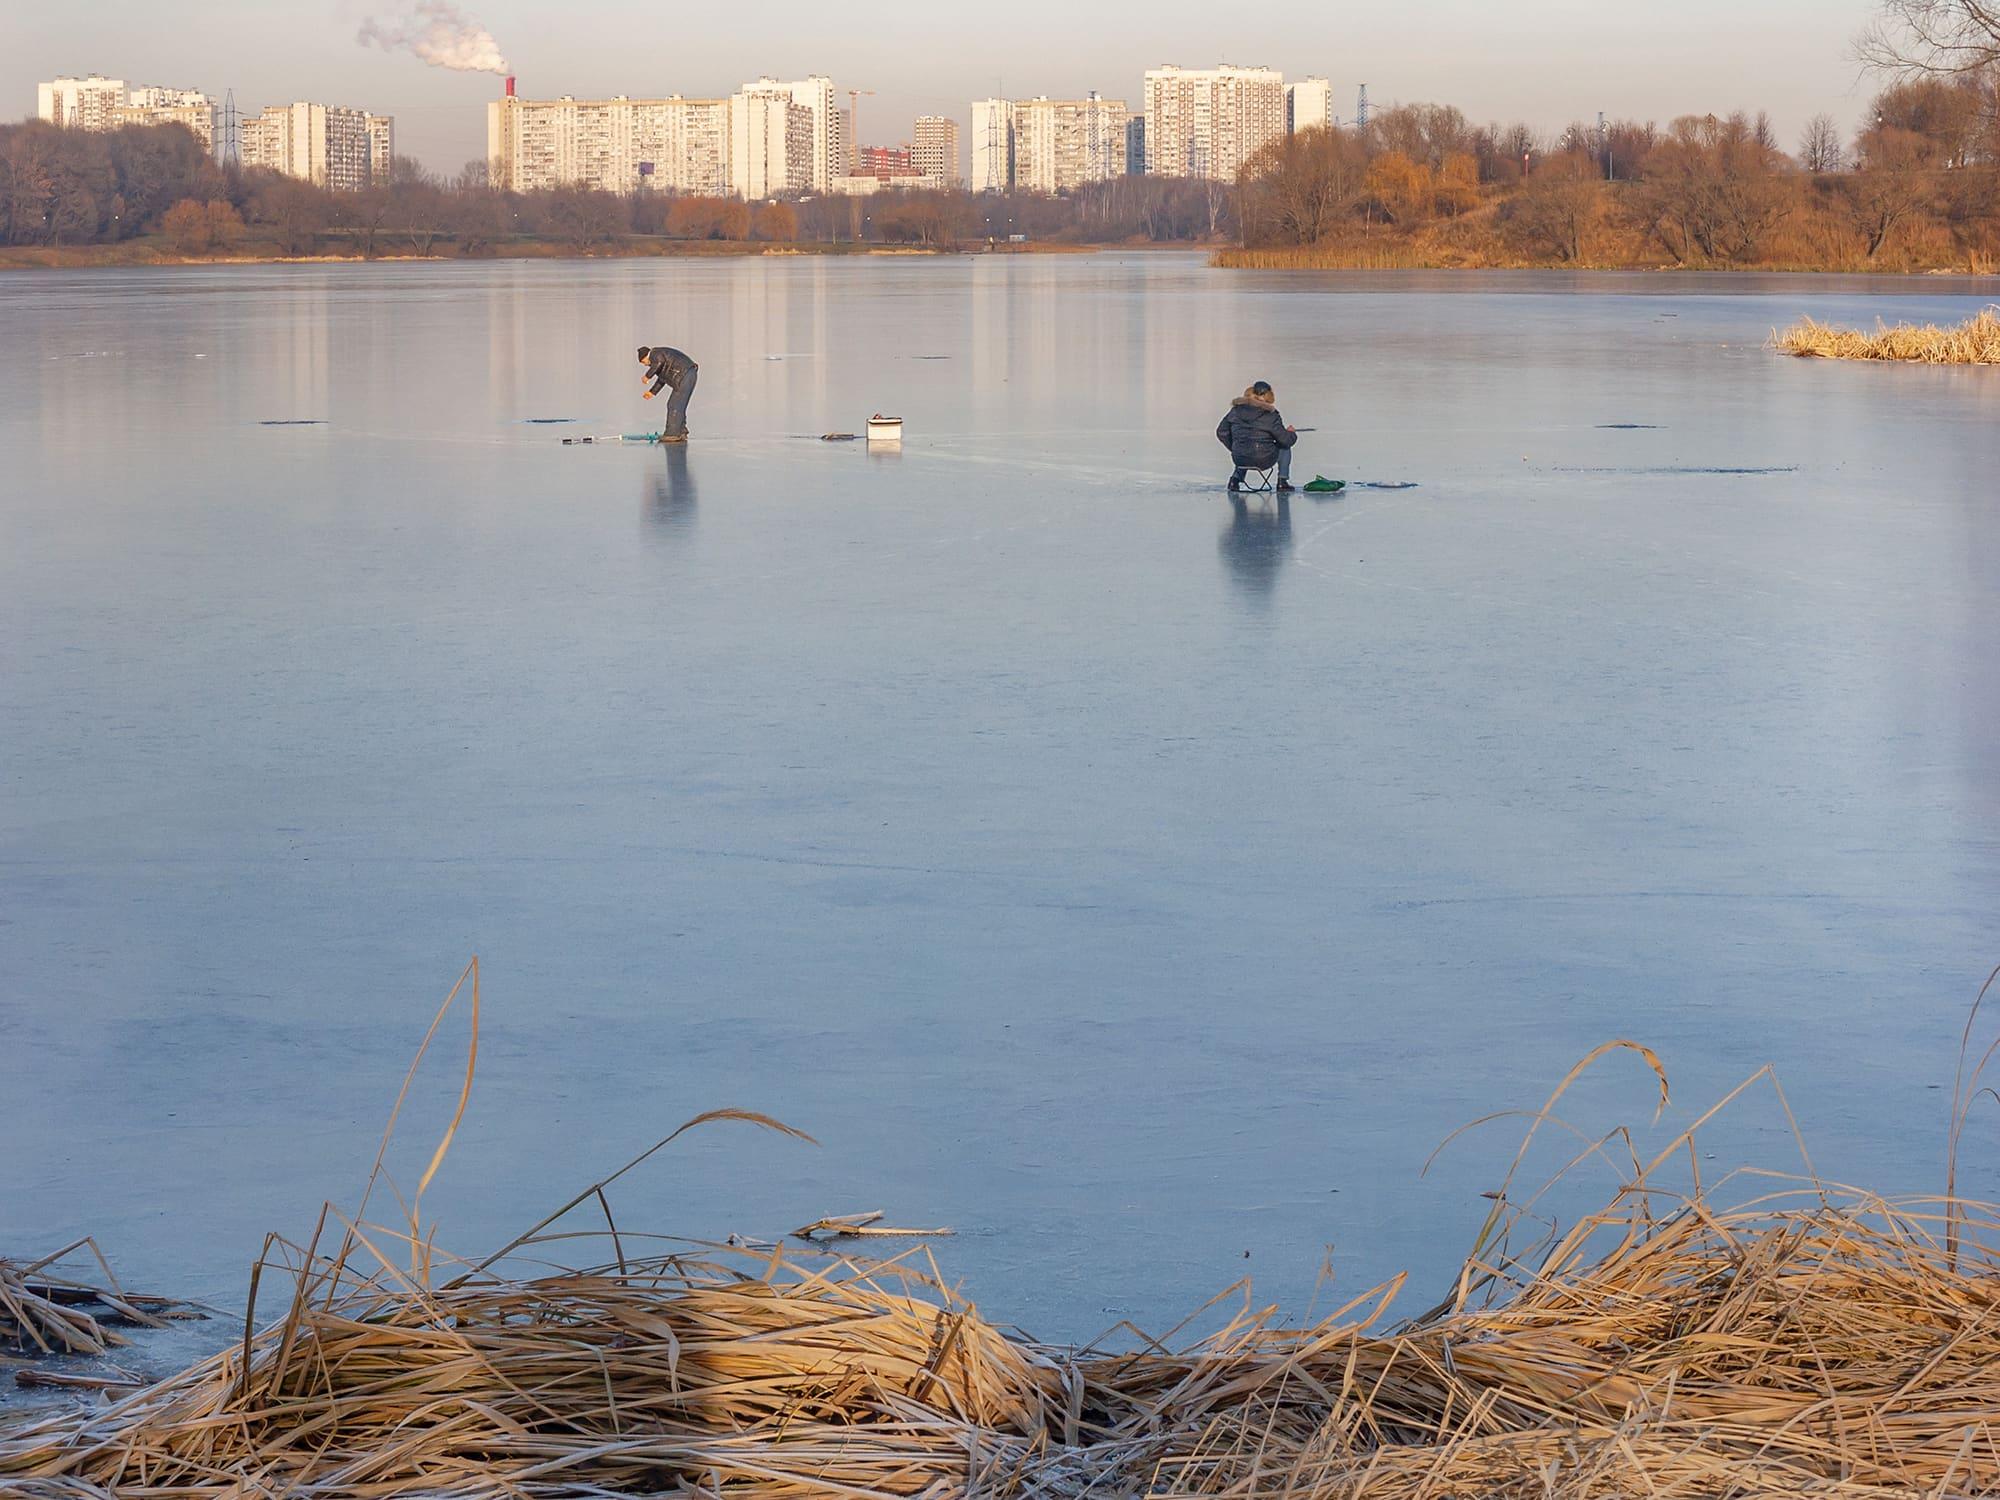 Нижний Царицынский пруд. Подлёдная рыбалка